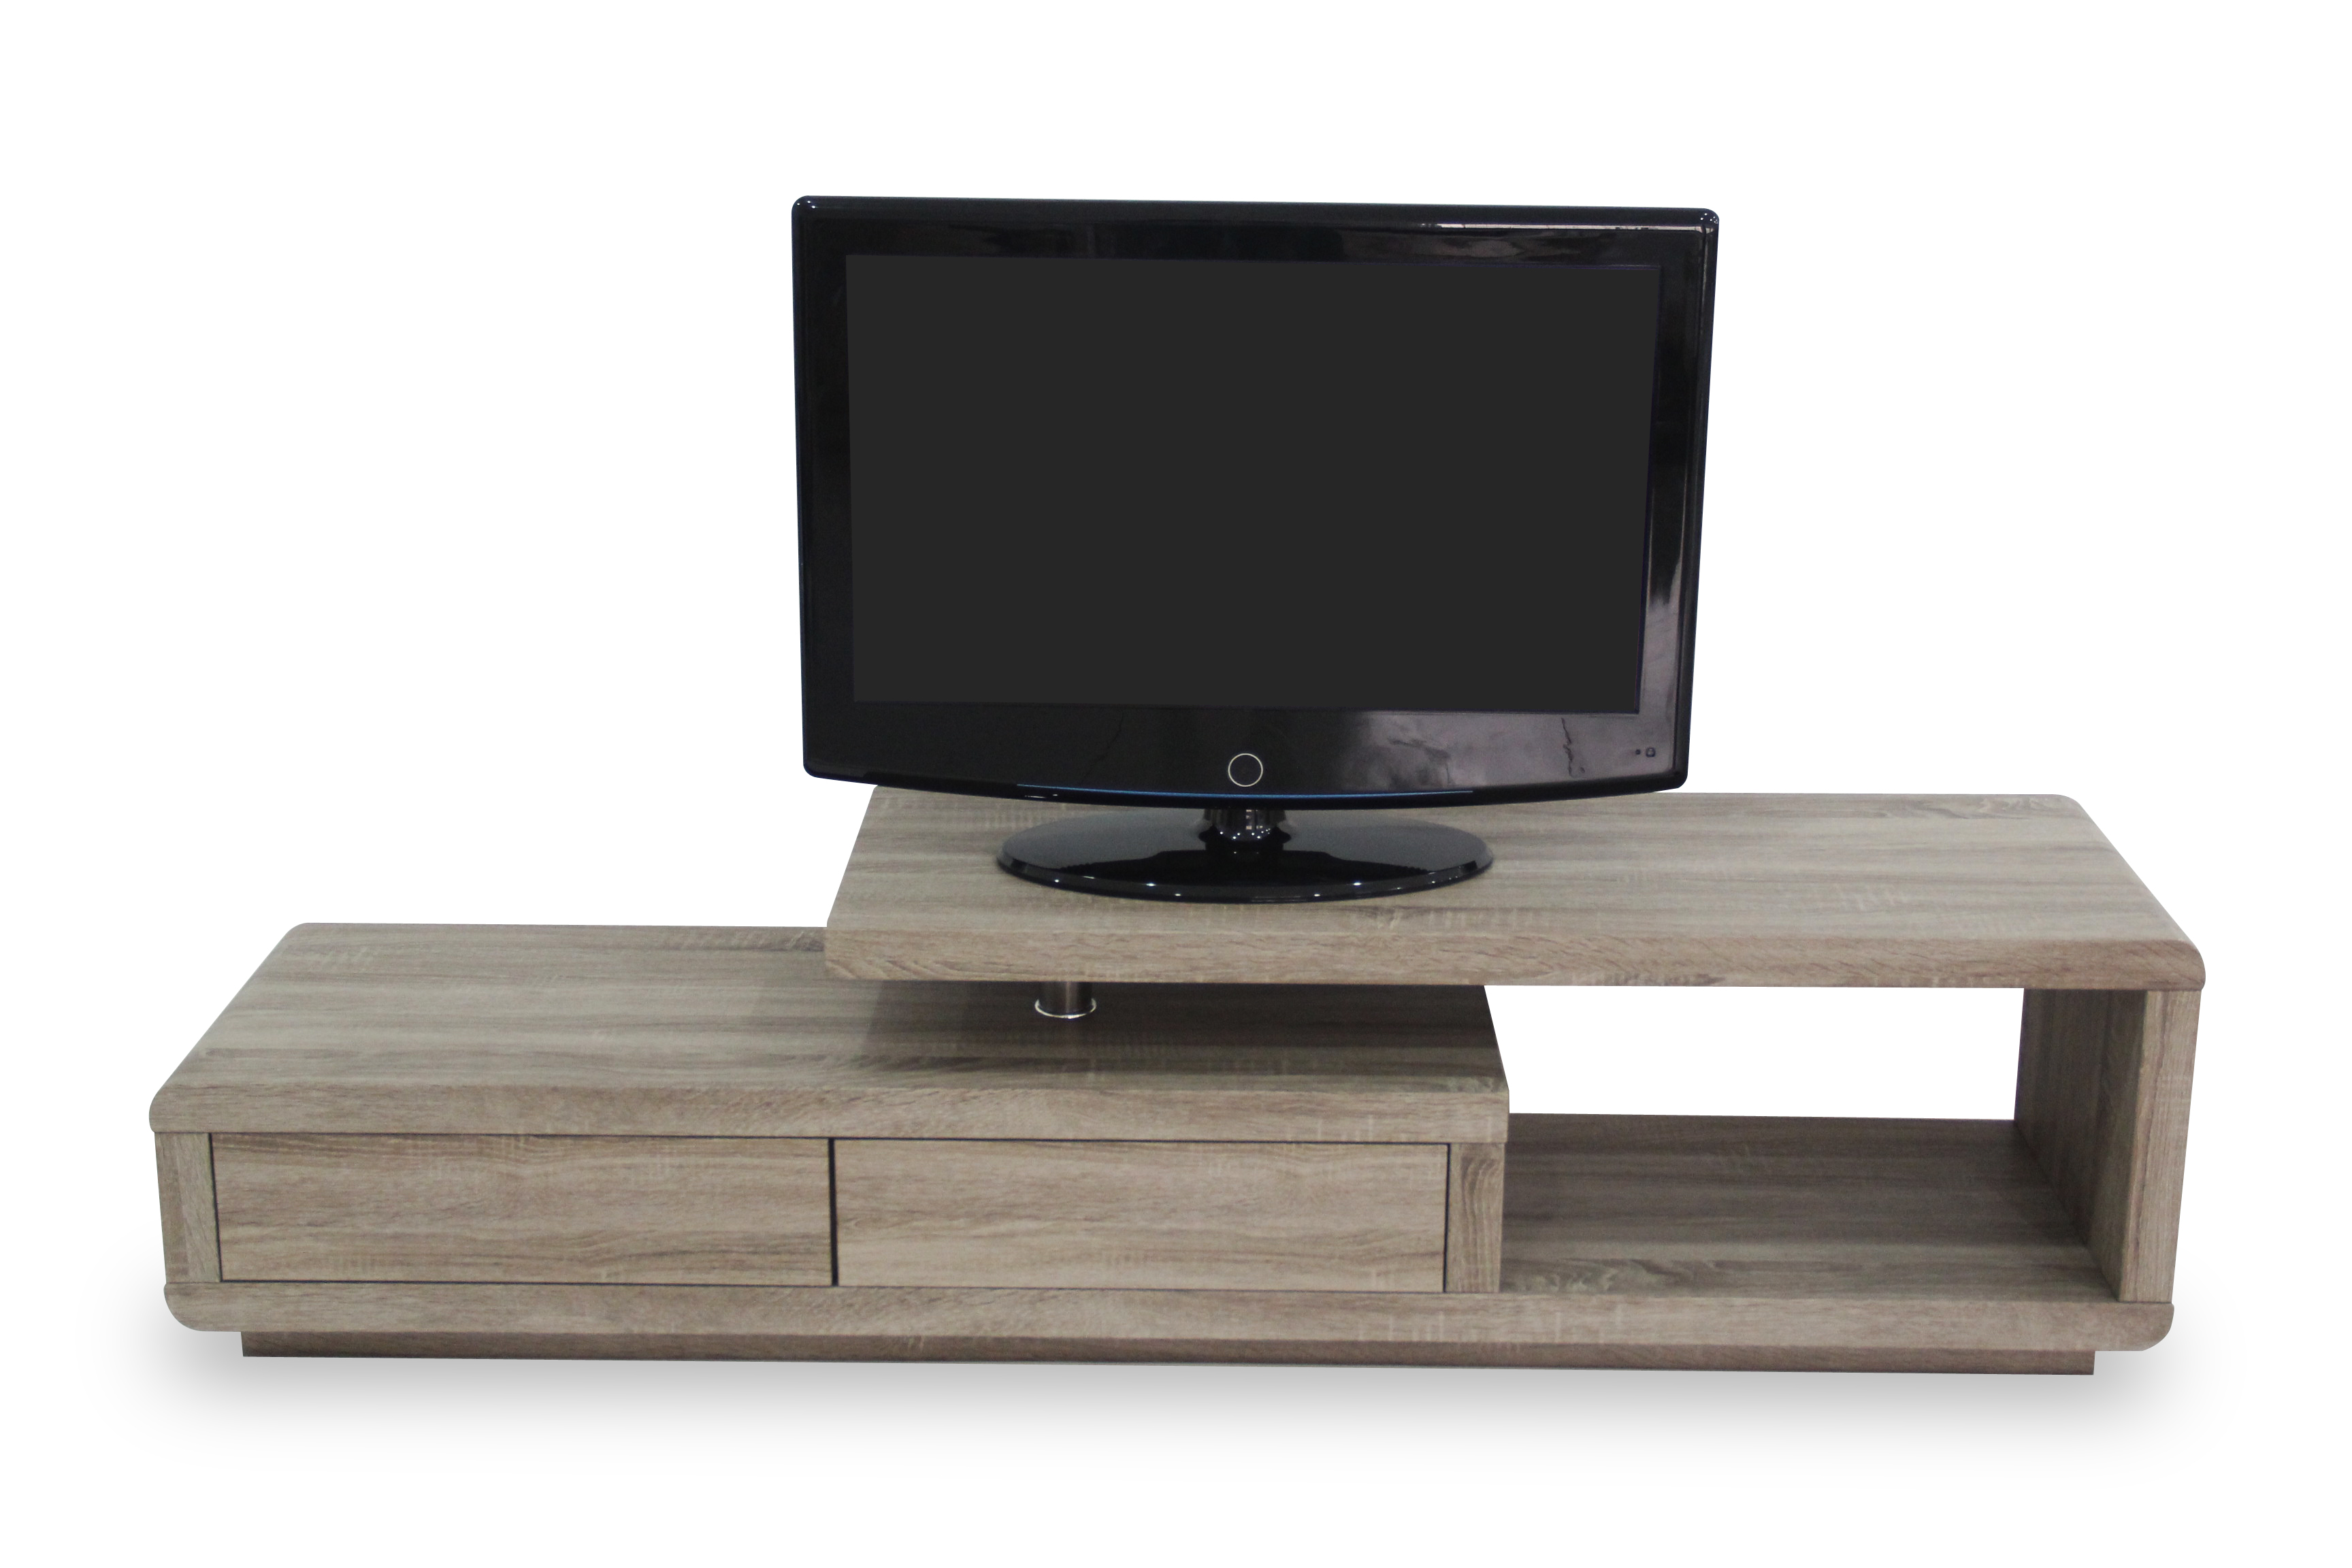 R 2110 Meuble Tv Lcd 180 Cm Ch Ne Sonoma Fonc Modiva # Meuble Tv Chene Sonoma